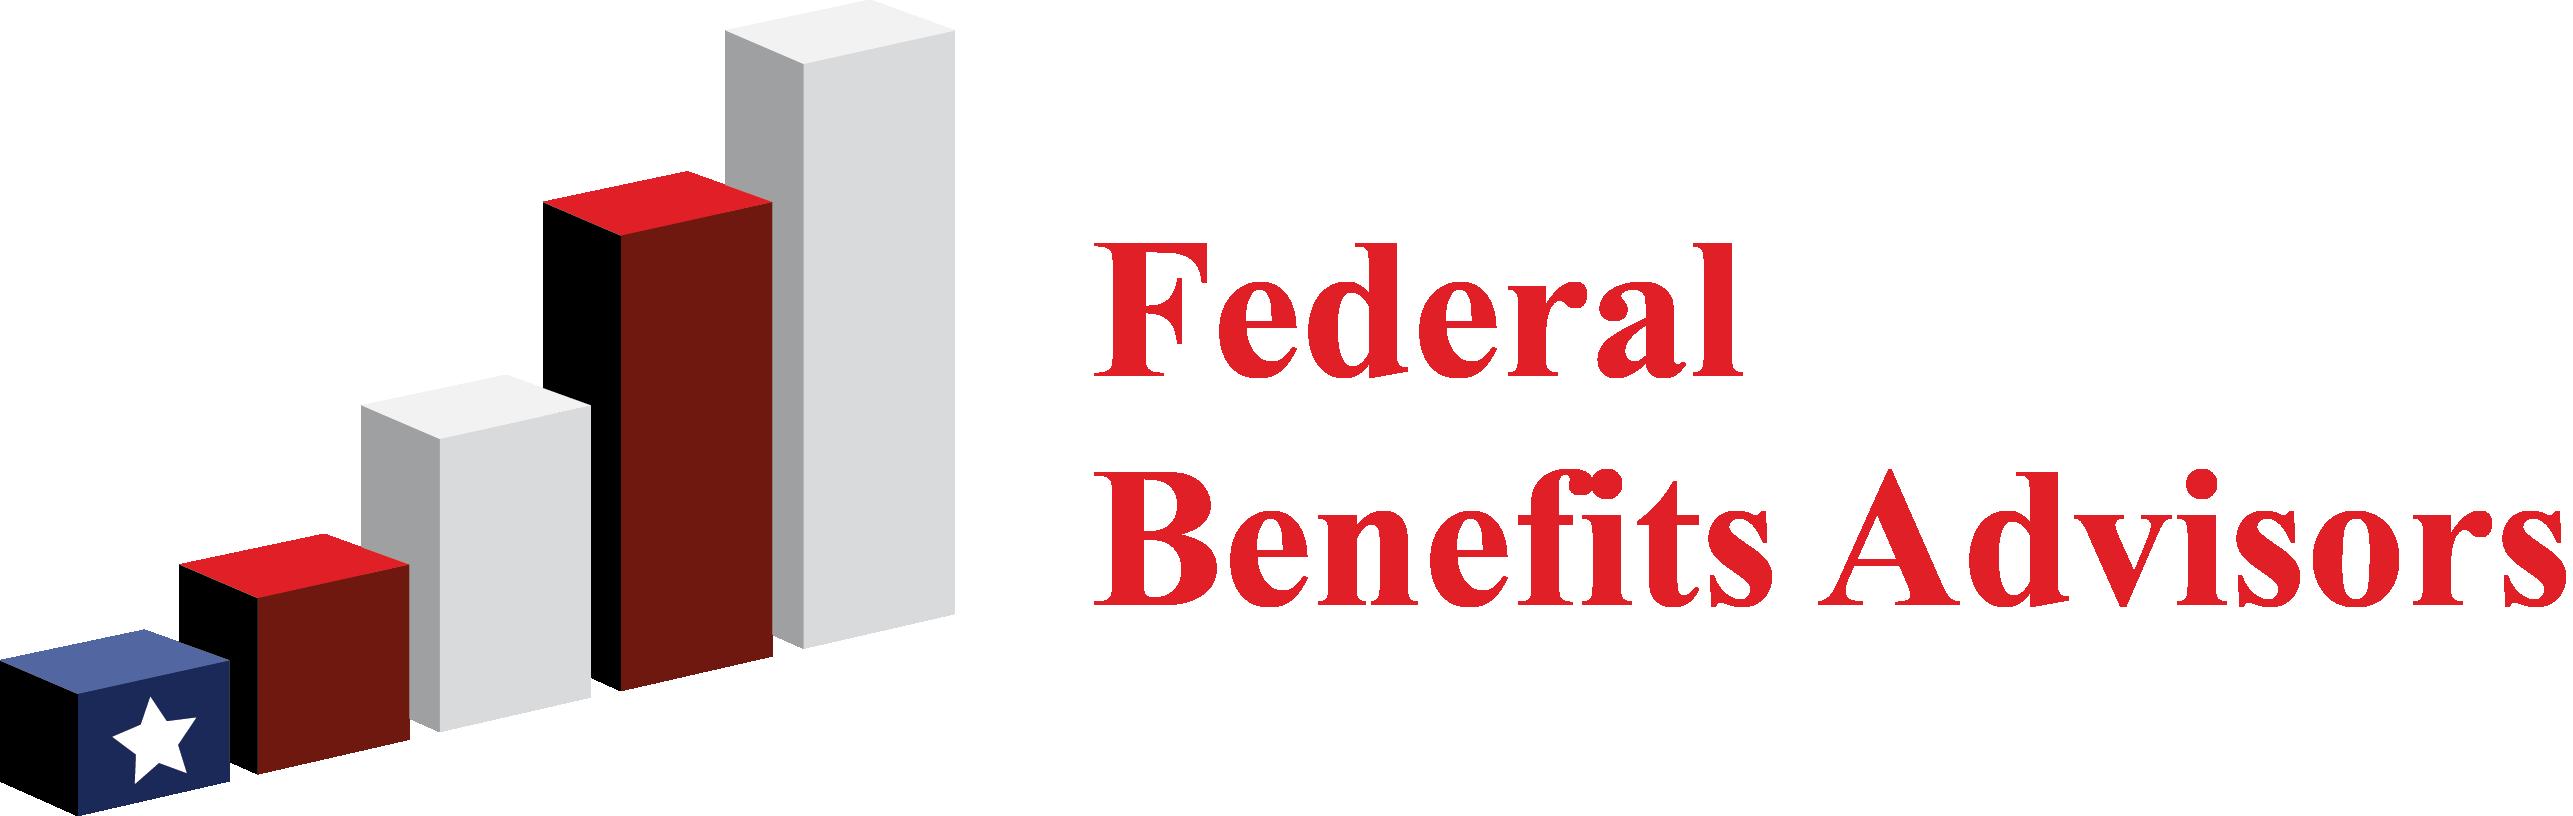 Federal Benefits Advisors